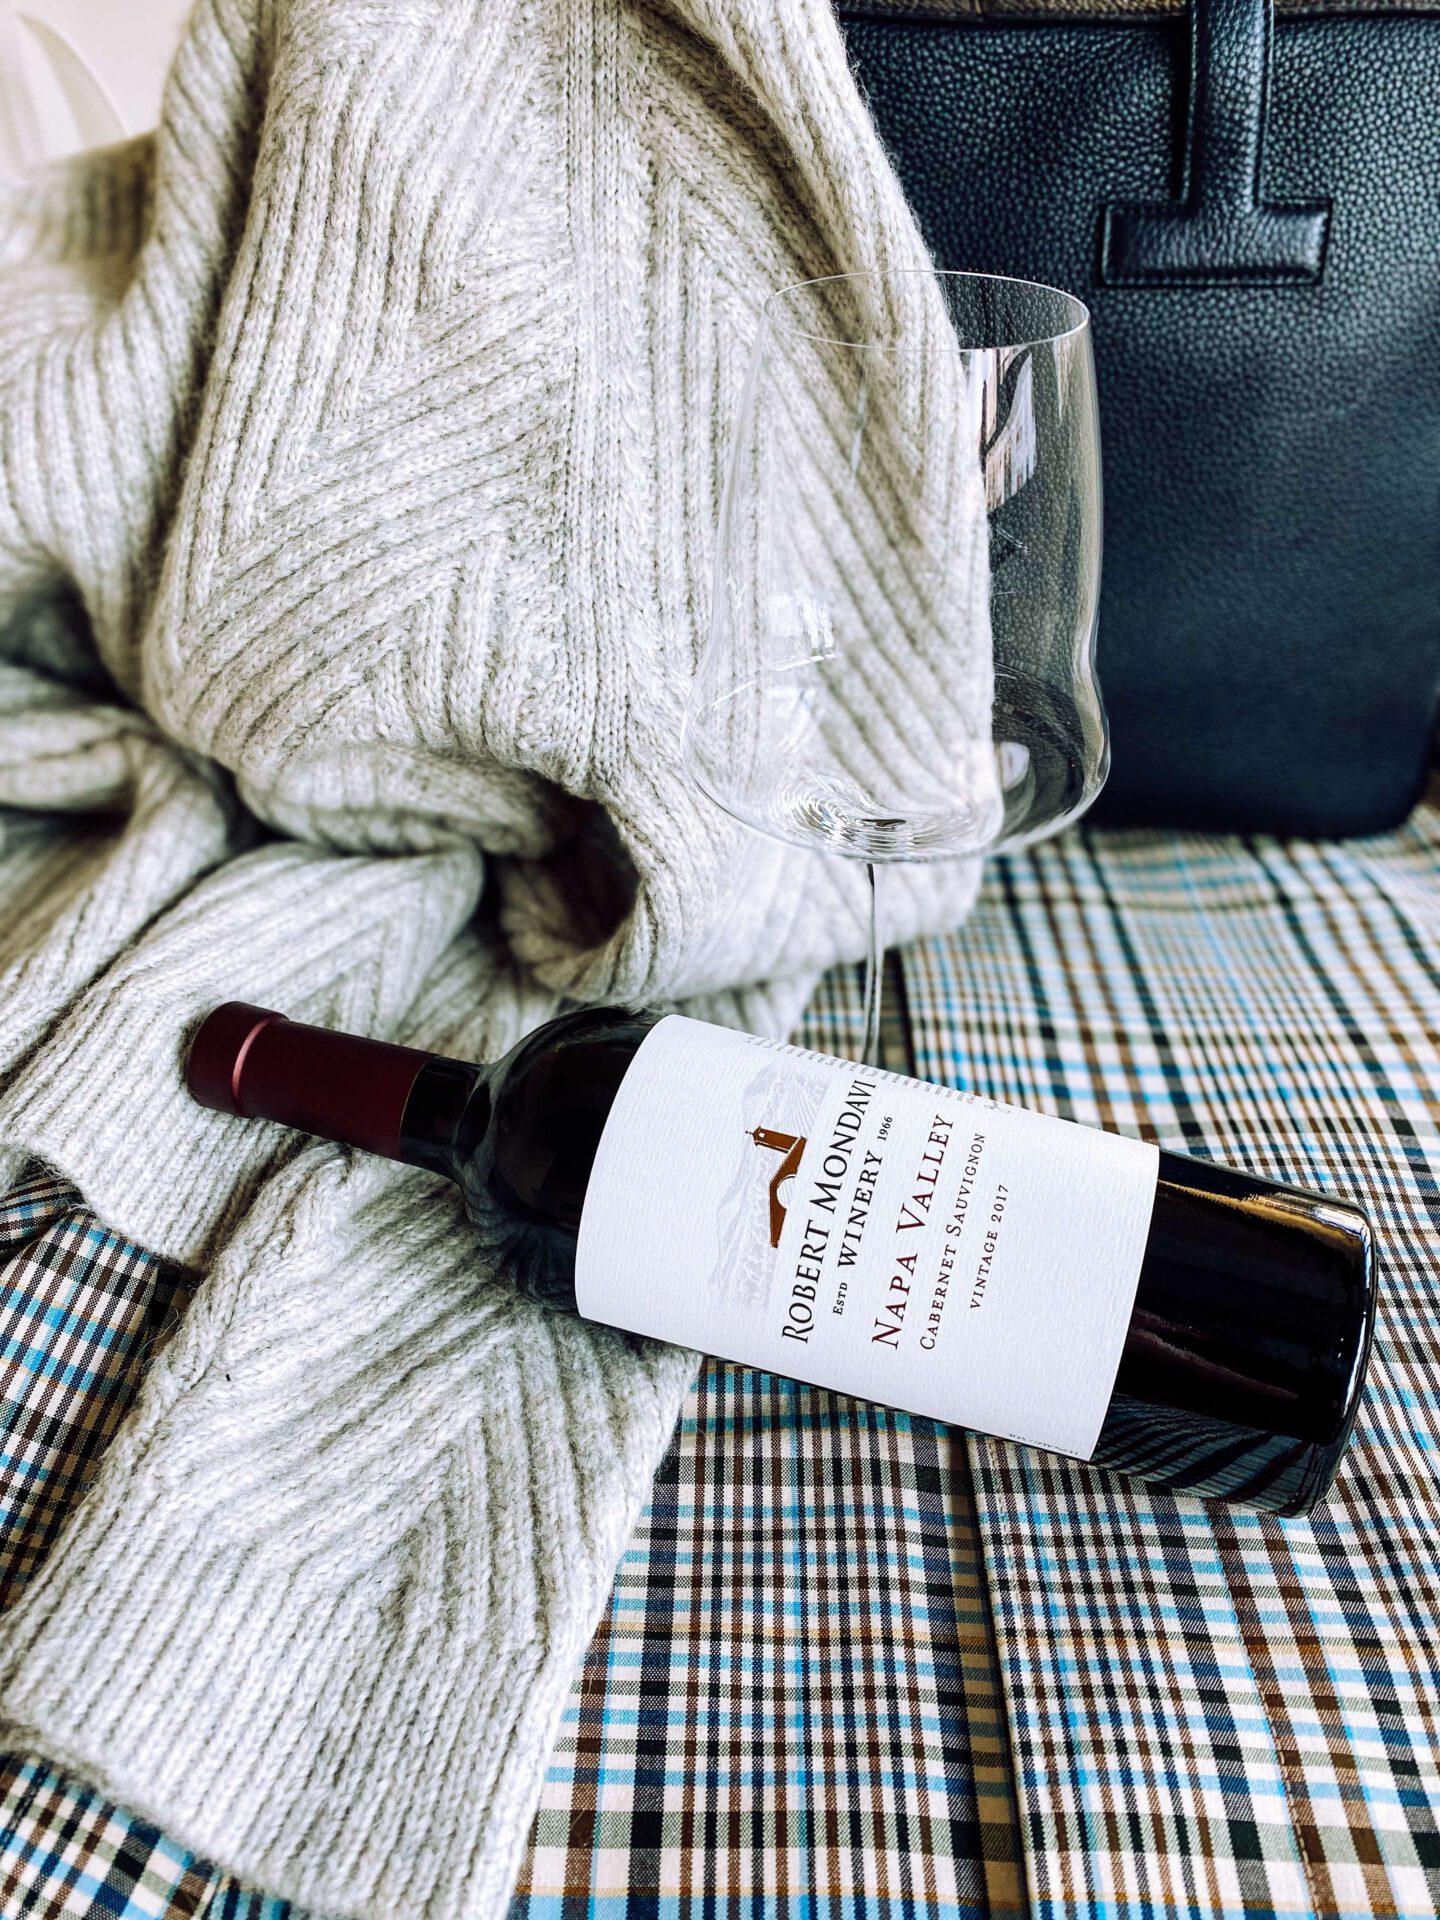 josephinenhütte josephine by Kurt Josef Zalto Robert Mondavi nappa valley cabernet sauvignon